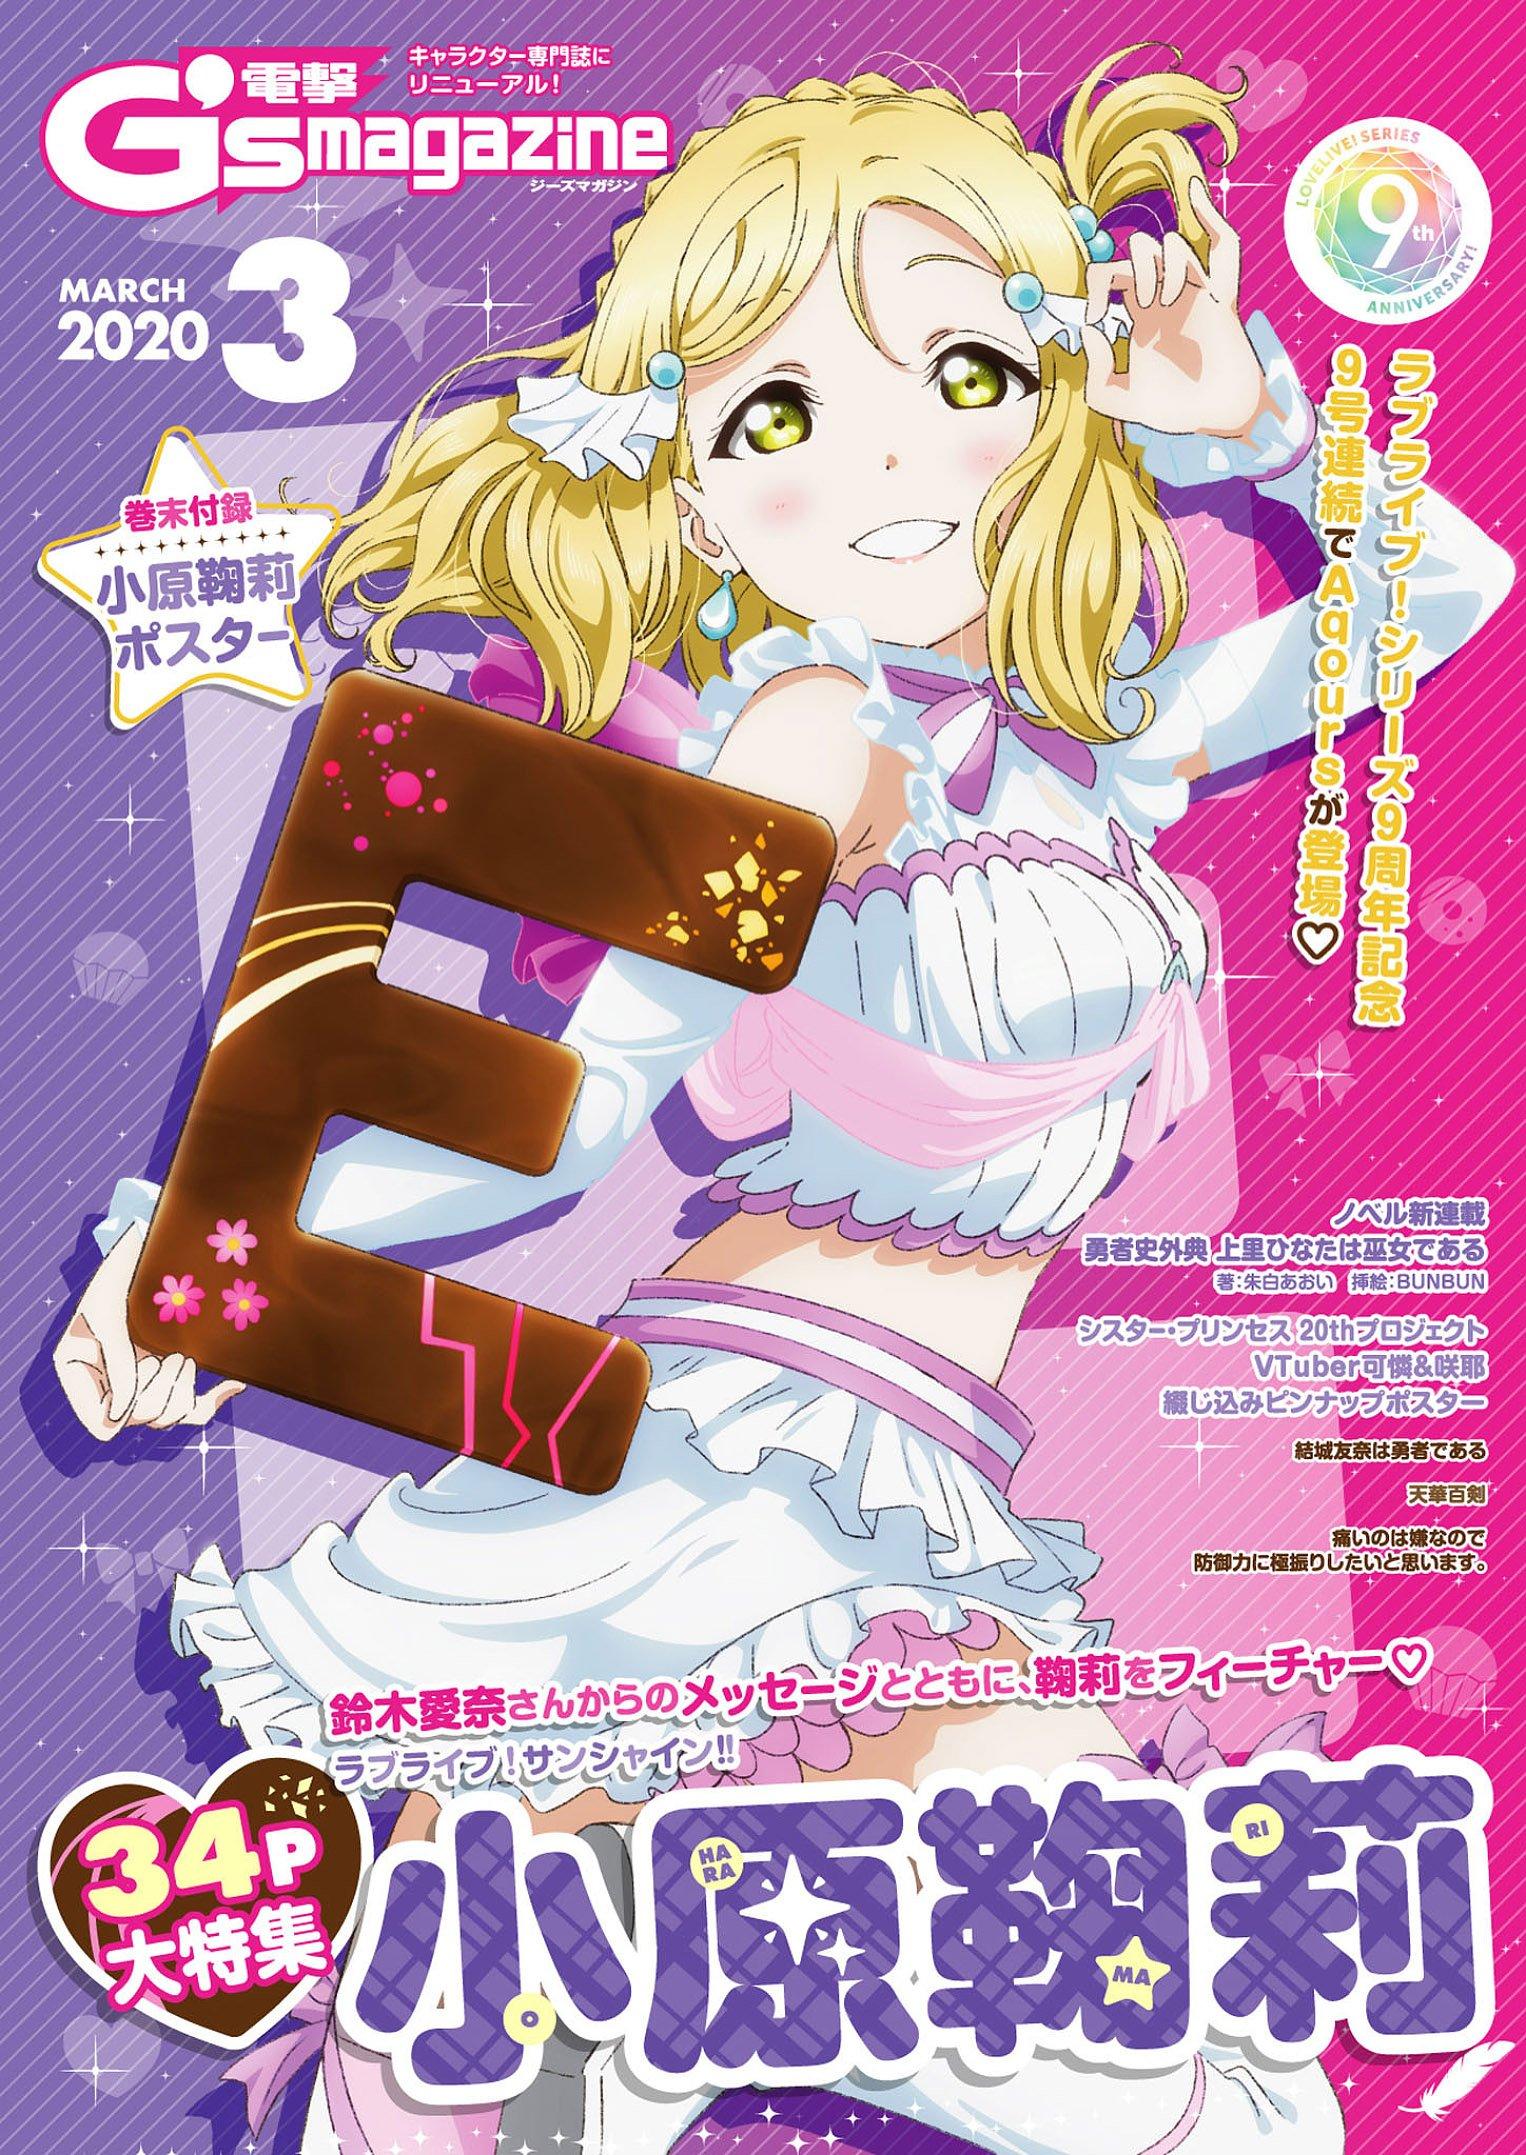 Dengeki G's Magazine Issue 272 (March 2020)